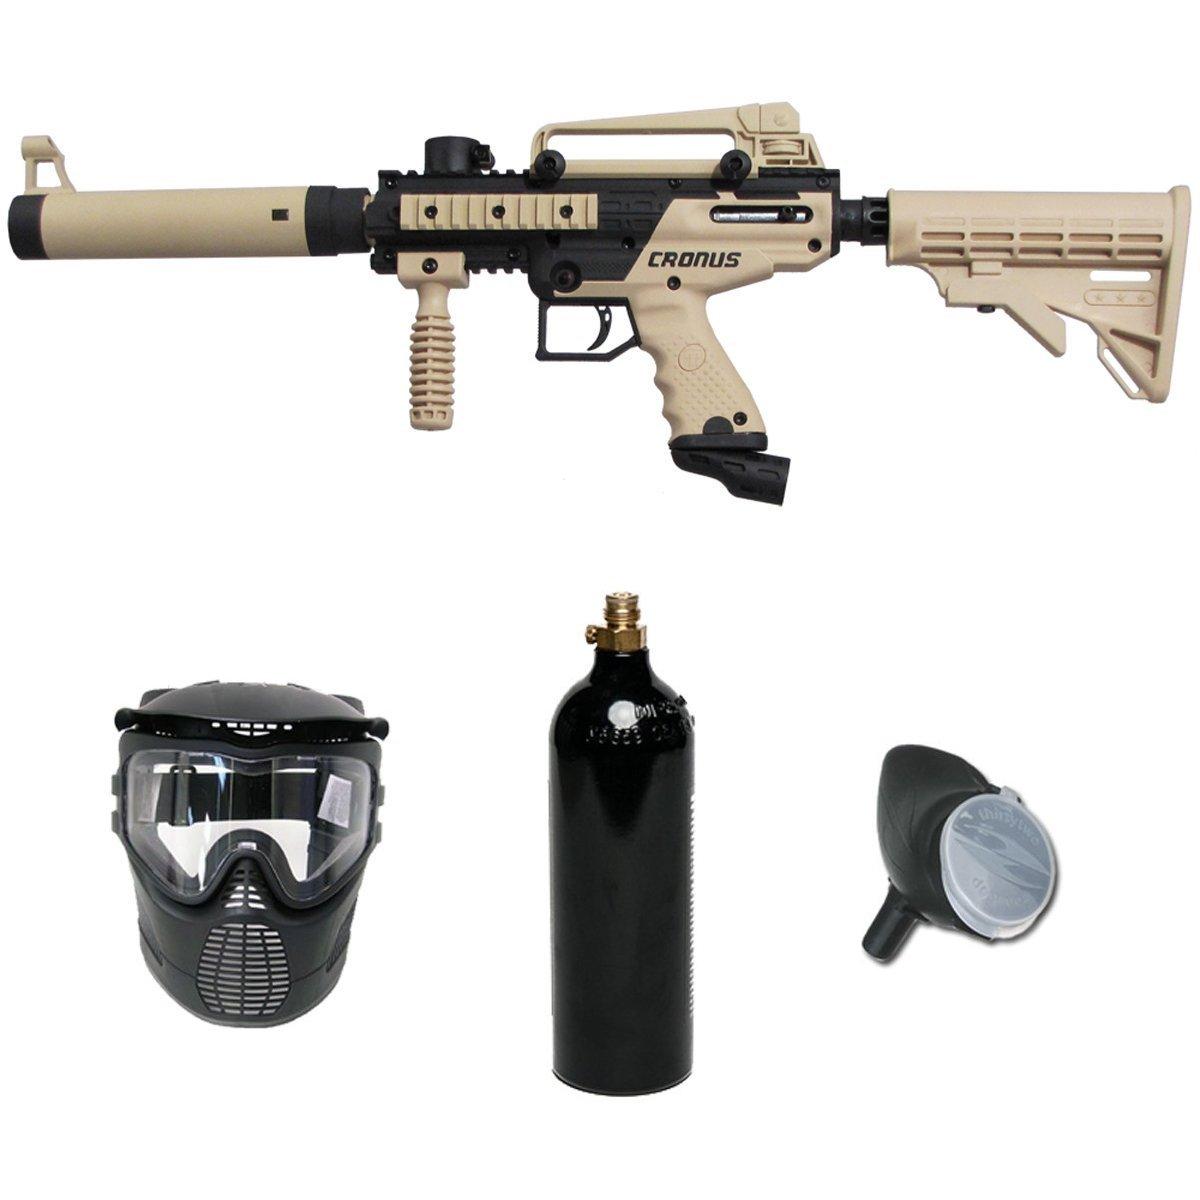 Tippmann Cronus Paintball Marker Gun -Tactical Edition- Tan Basic Package